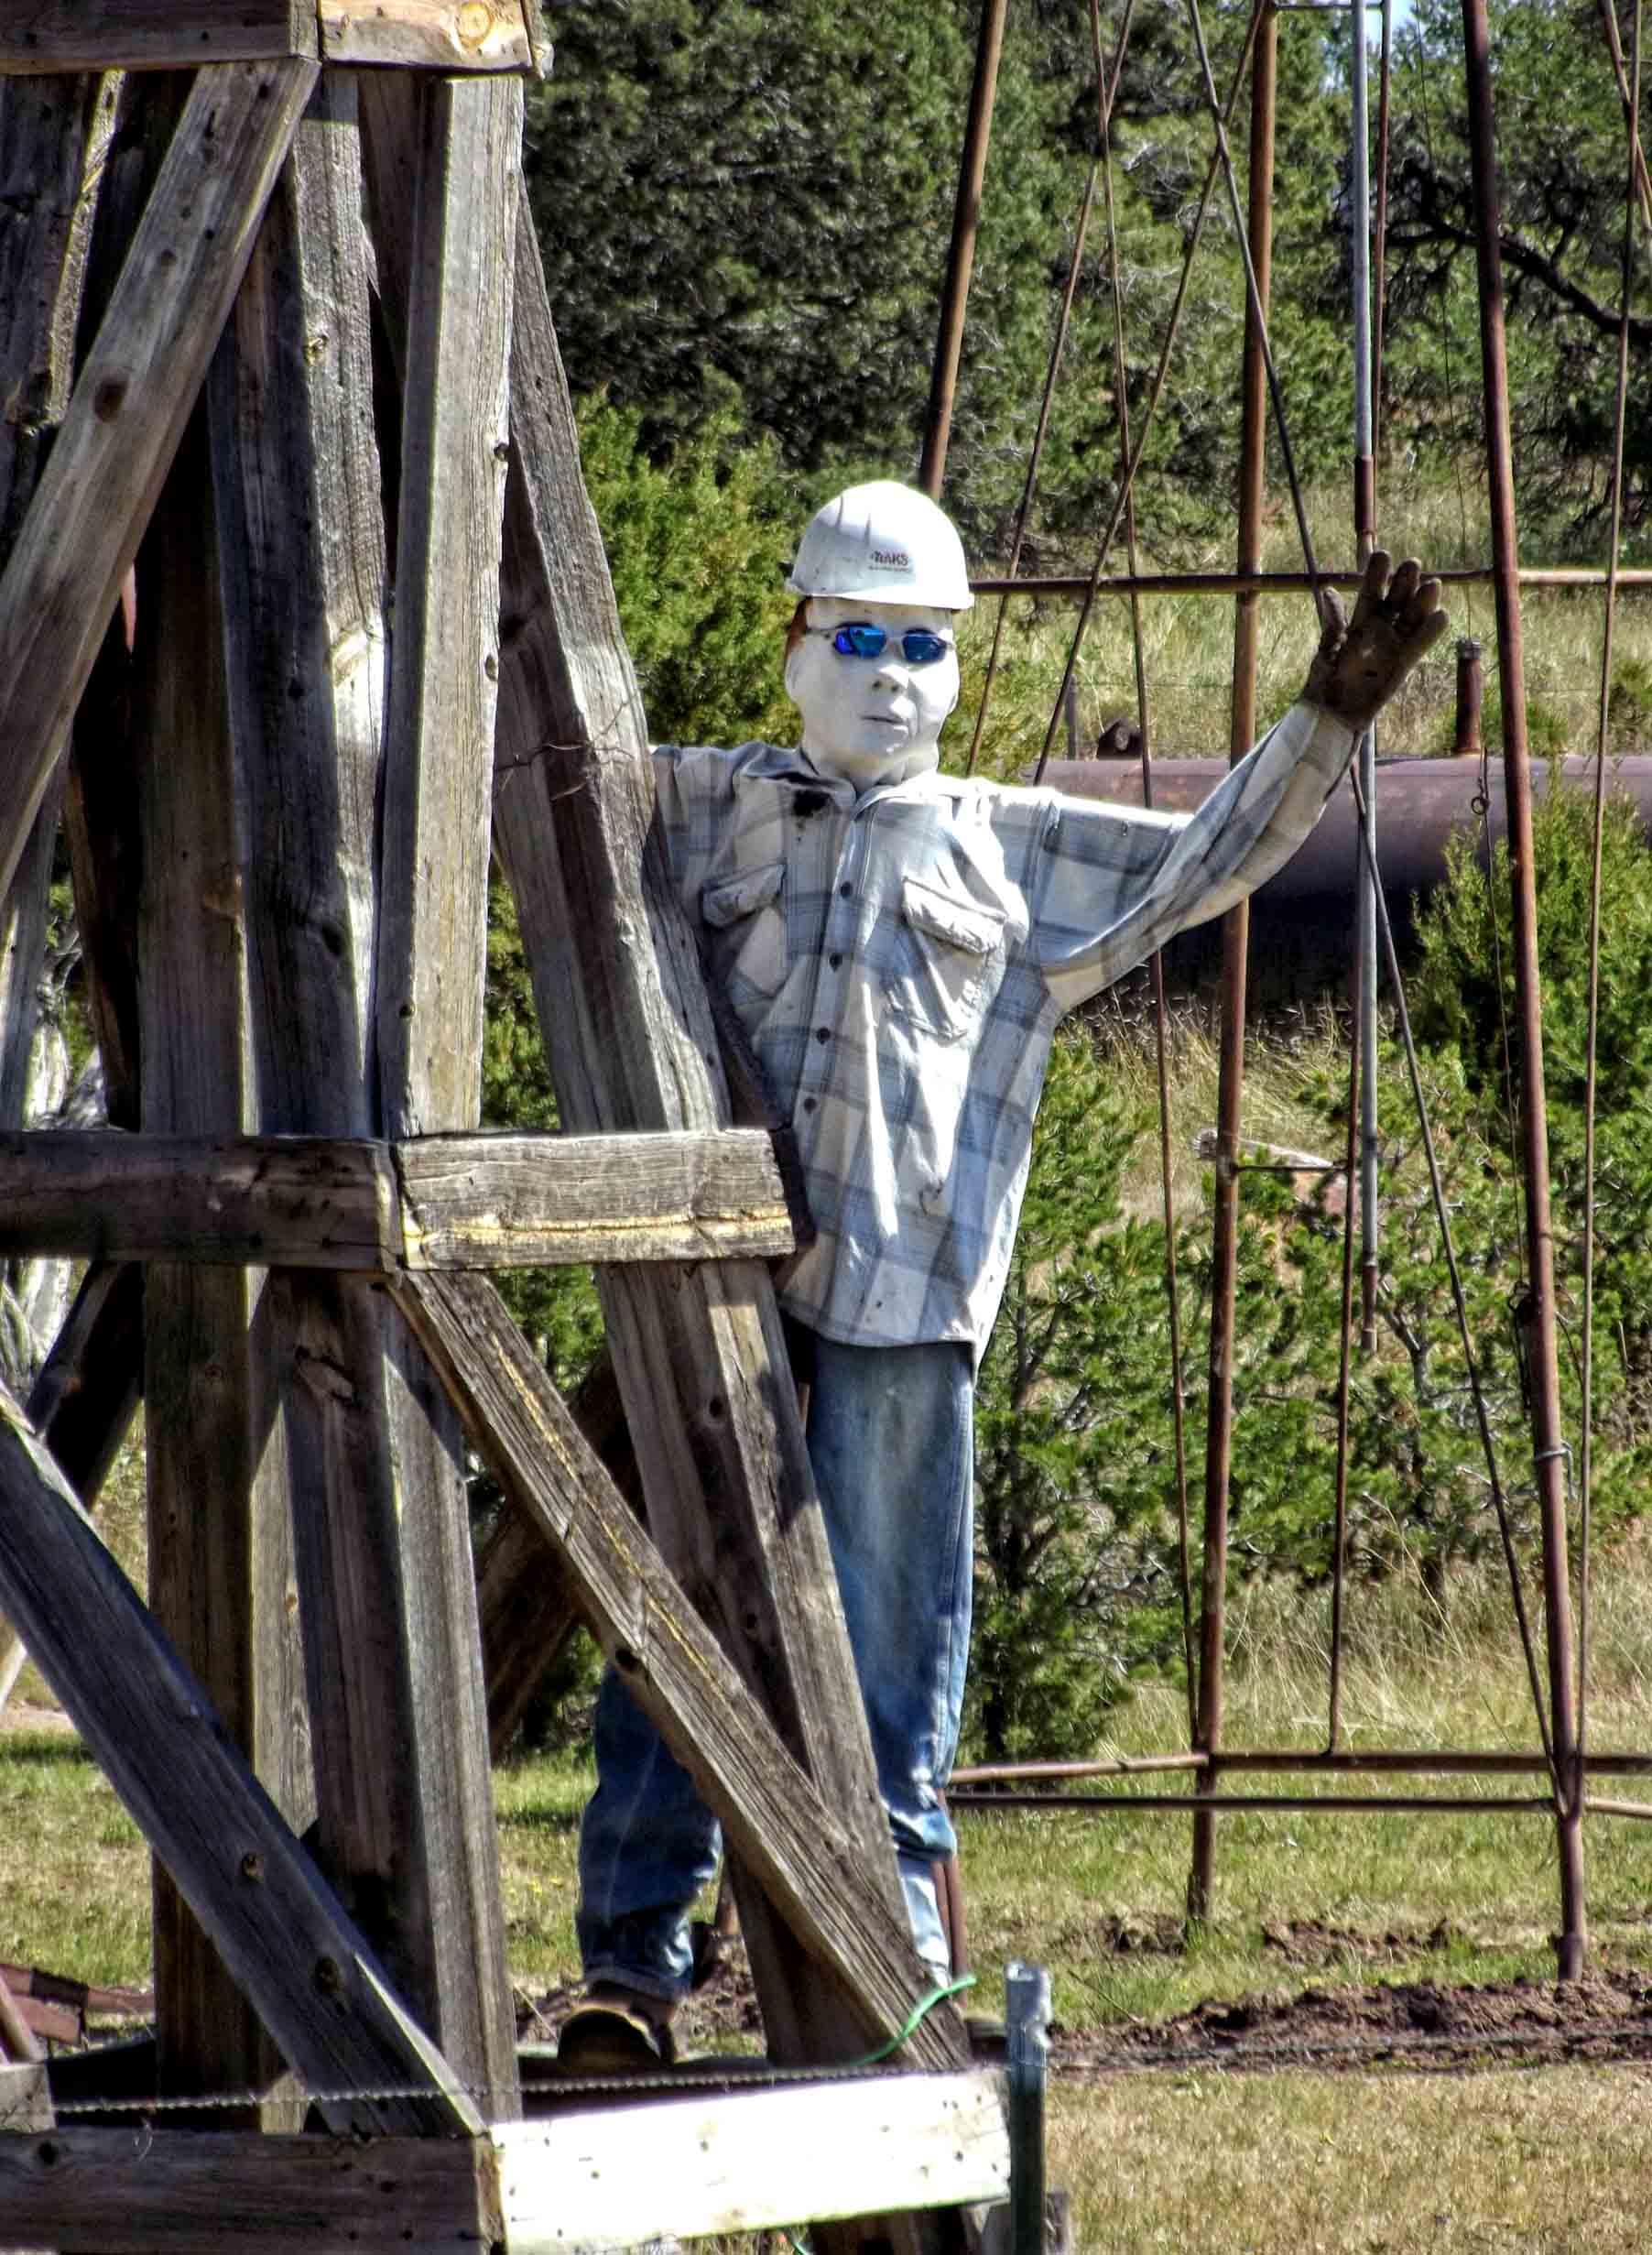 Model of man in lumberjack shirt and hard hat